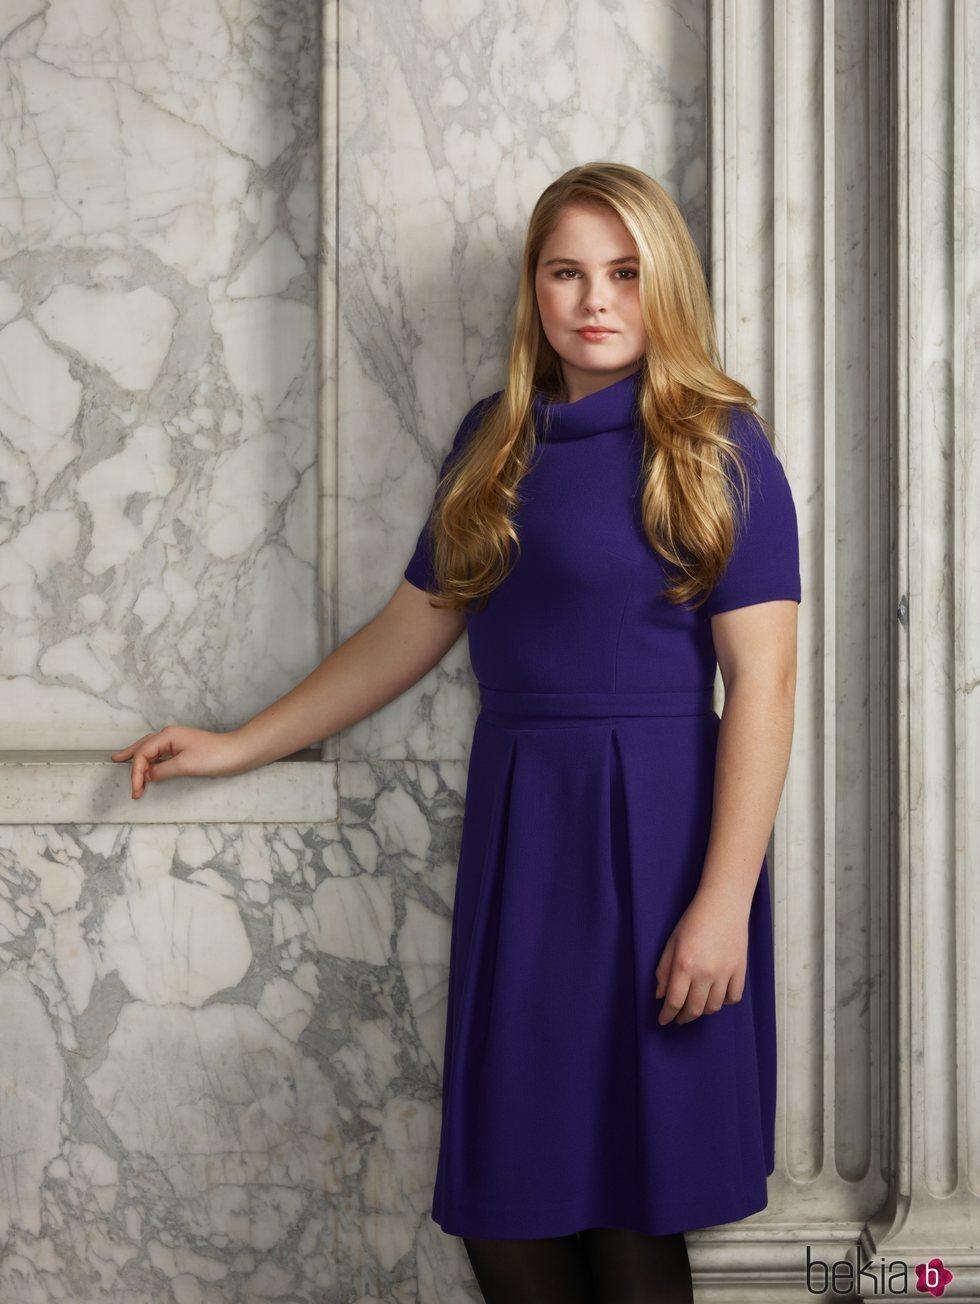 Retrato oficial de Amalia de Holanda